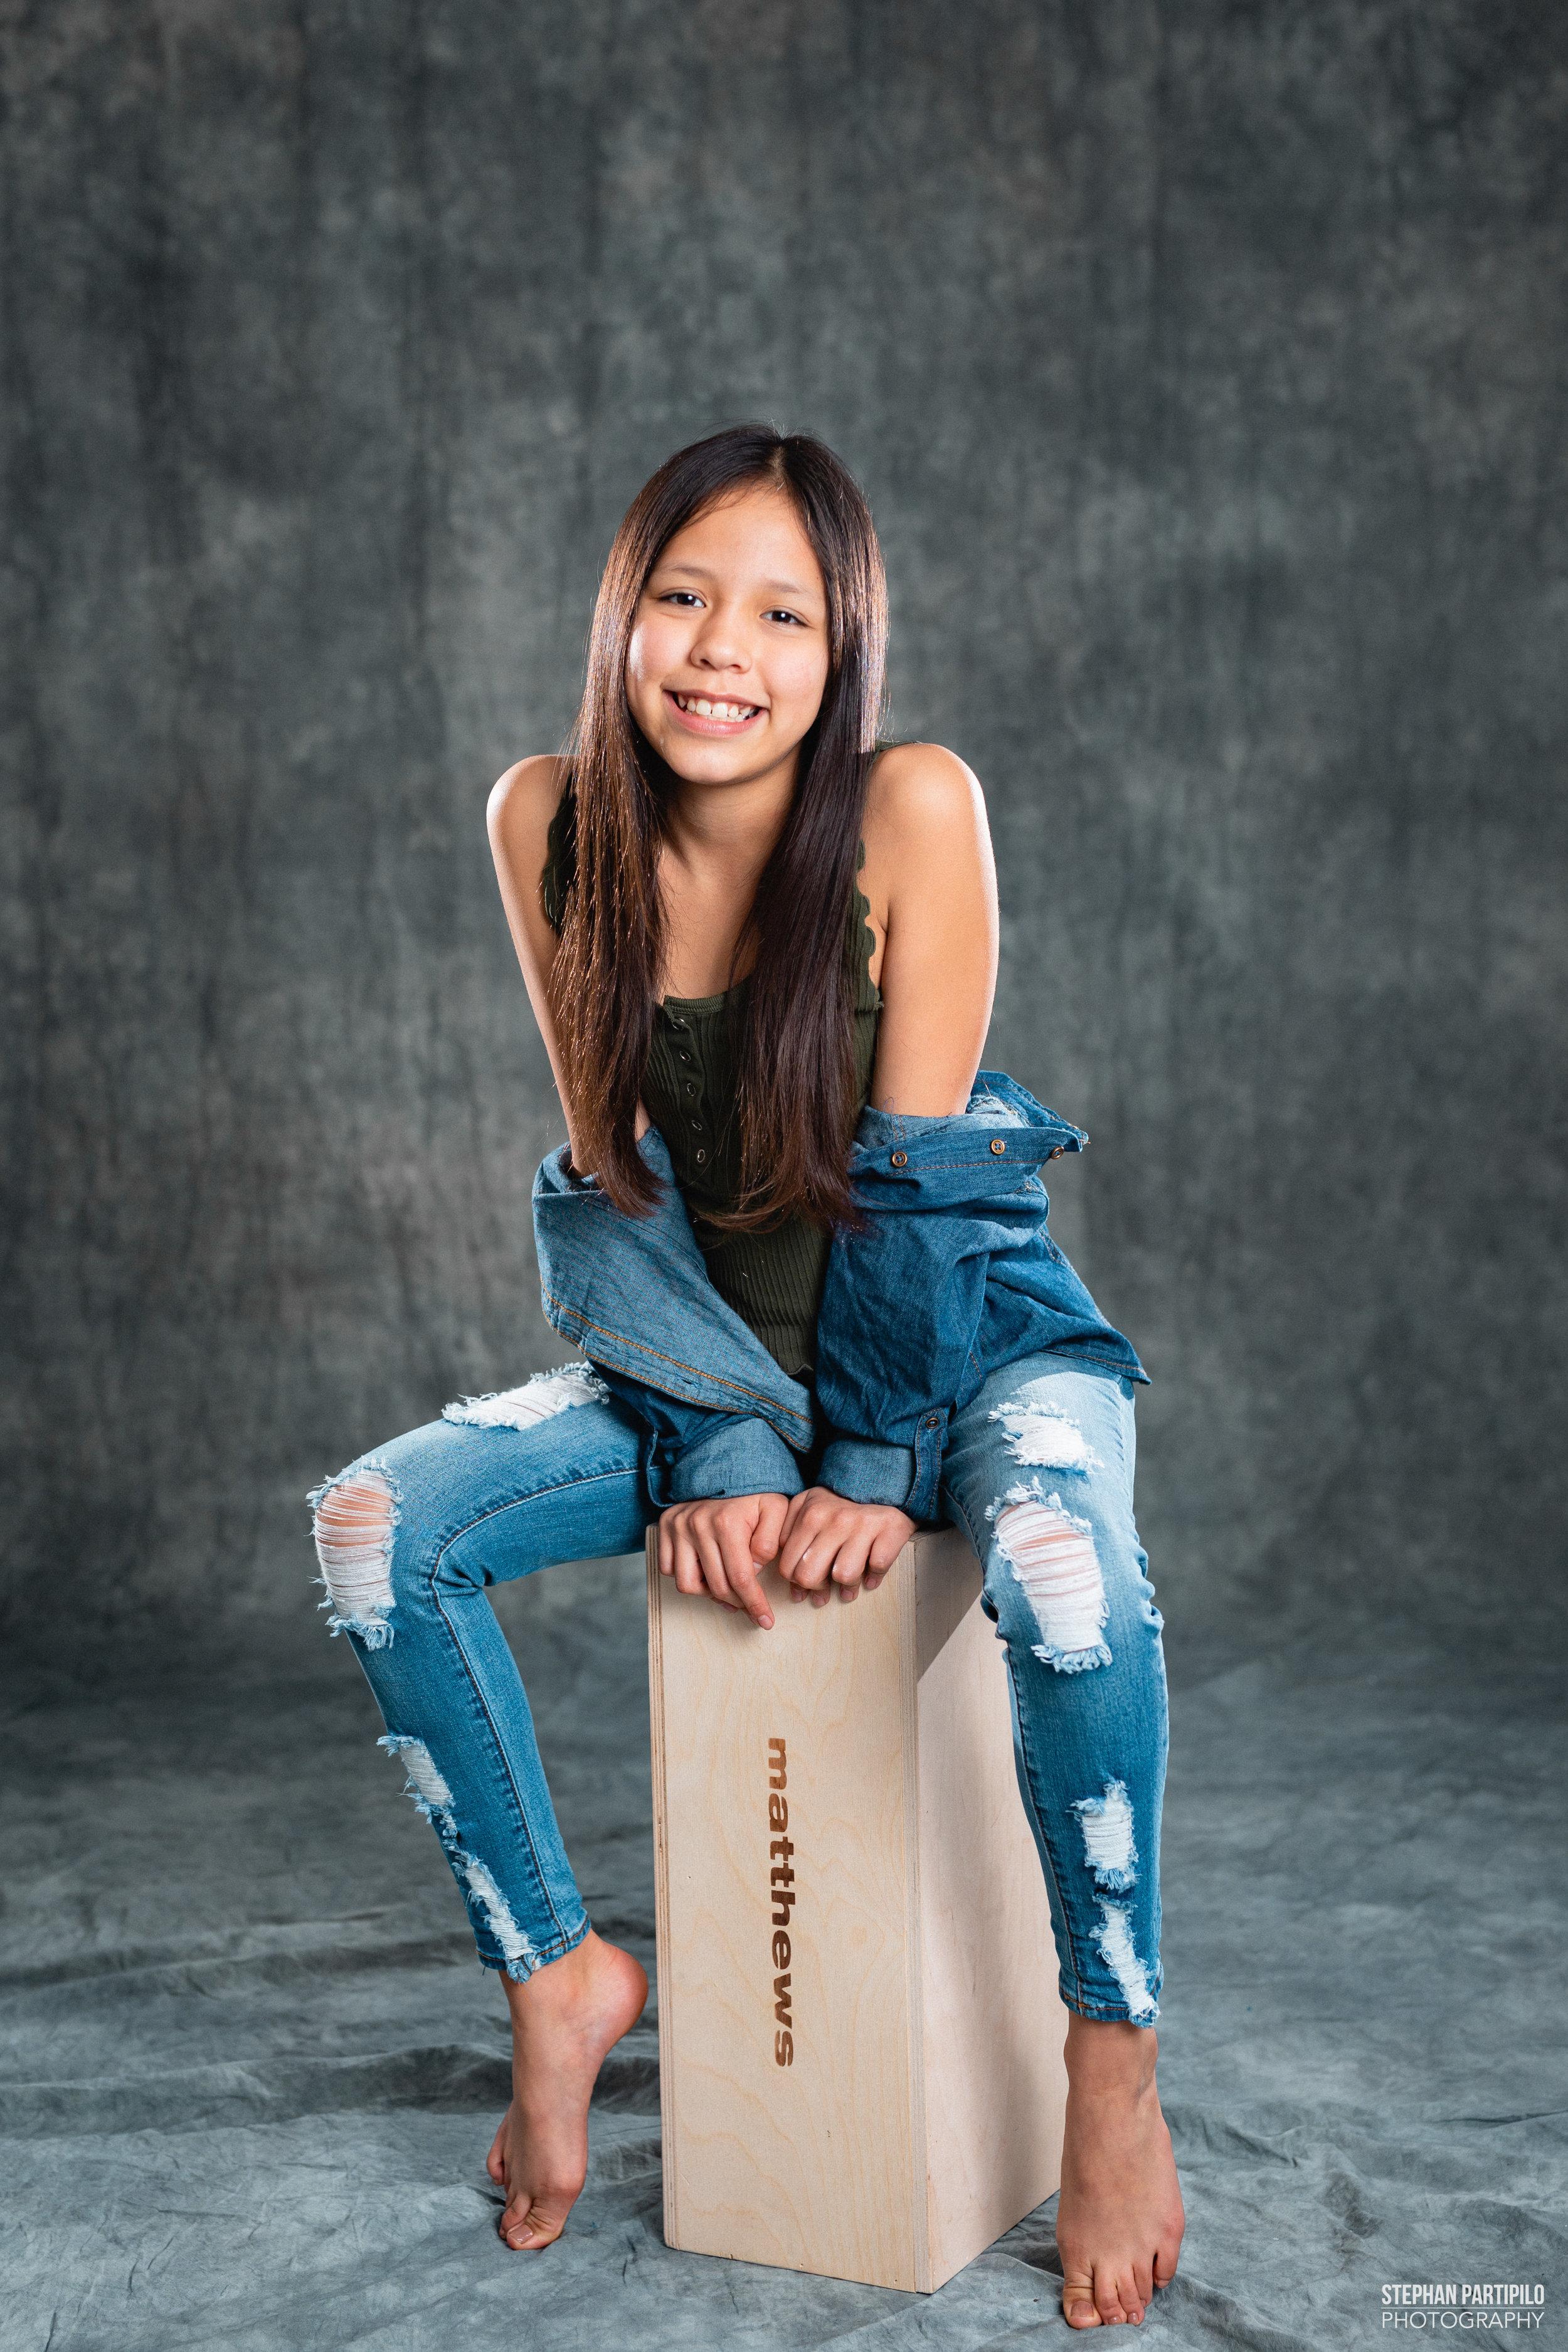 Marisol Child Model PDX 2019 0G5A9569.jpg